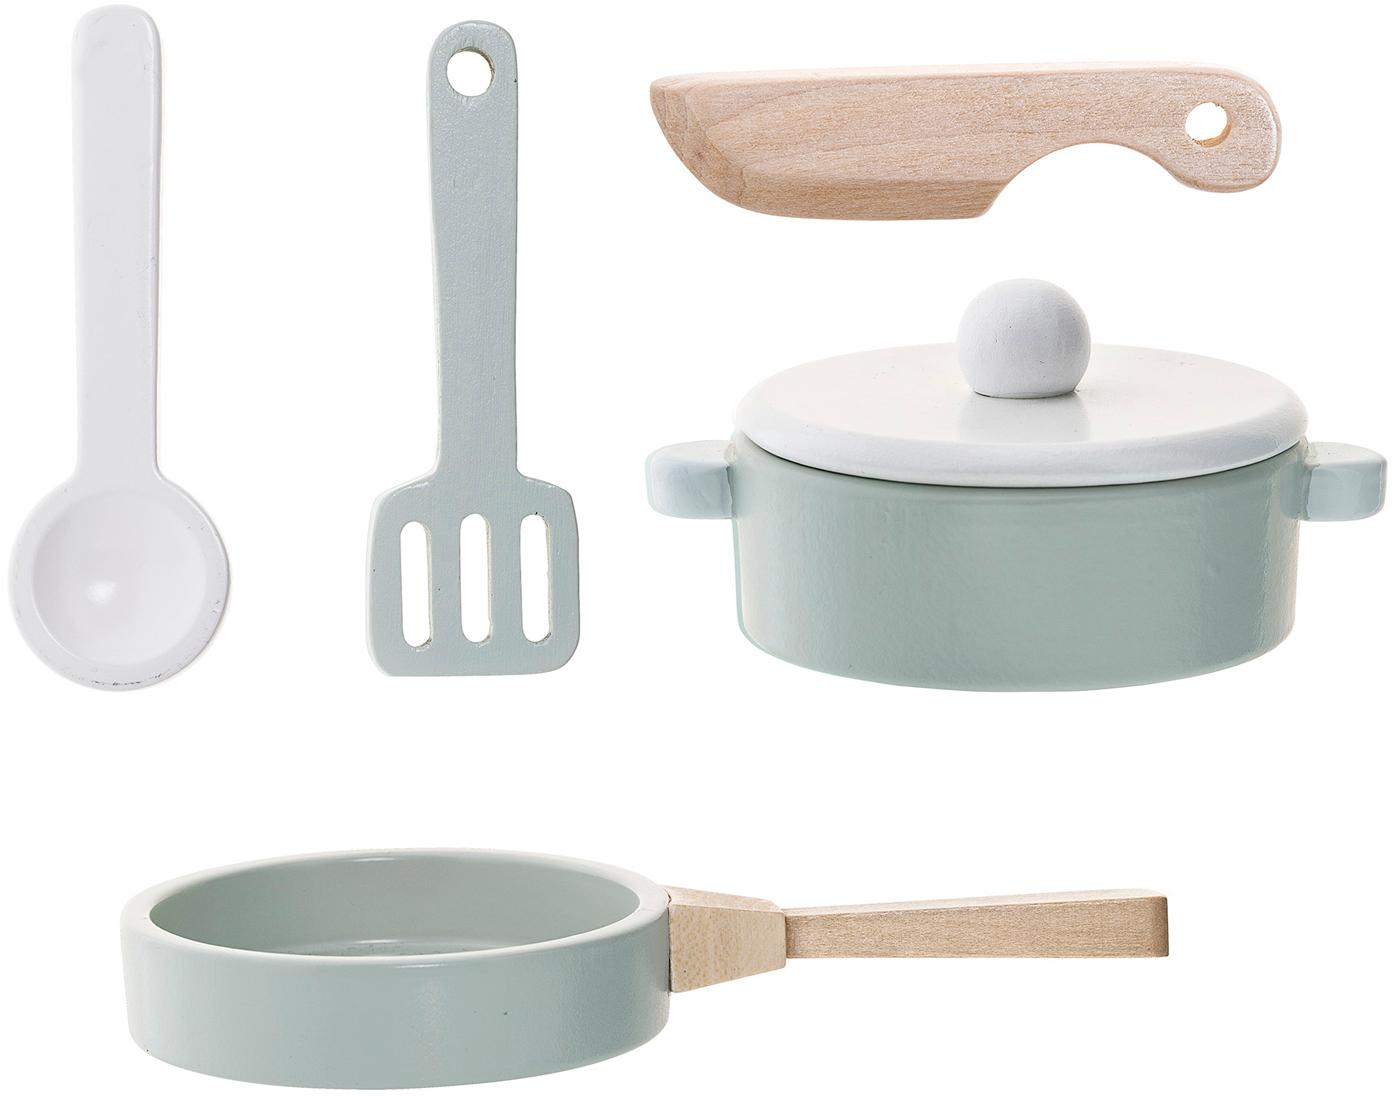 Set da gioco Cooking 5 pz, Pannello di fibra a media densità, legno schima, Blu, Set in varie misure